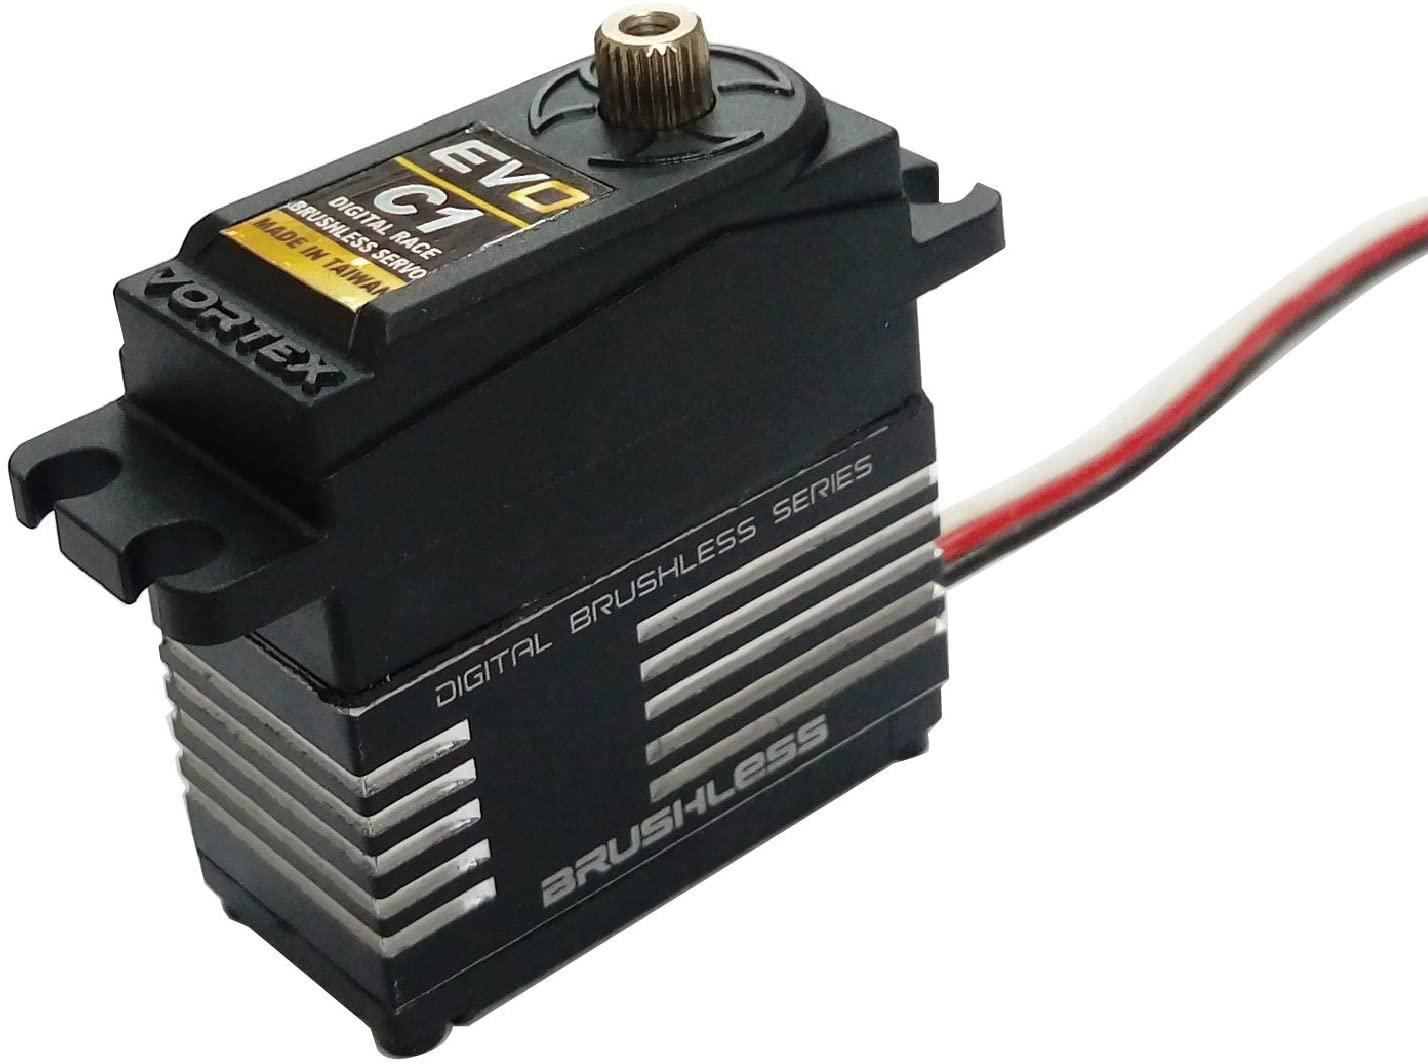 EVO-C1 / Digital Brushless Servo - High Speed High-Torque